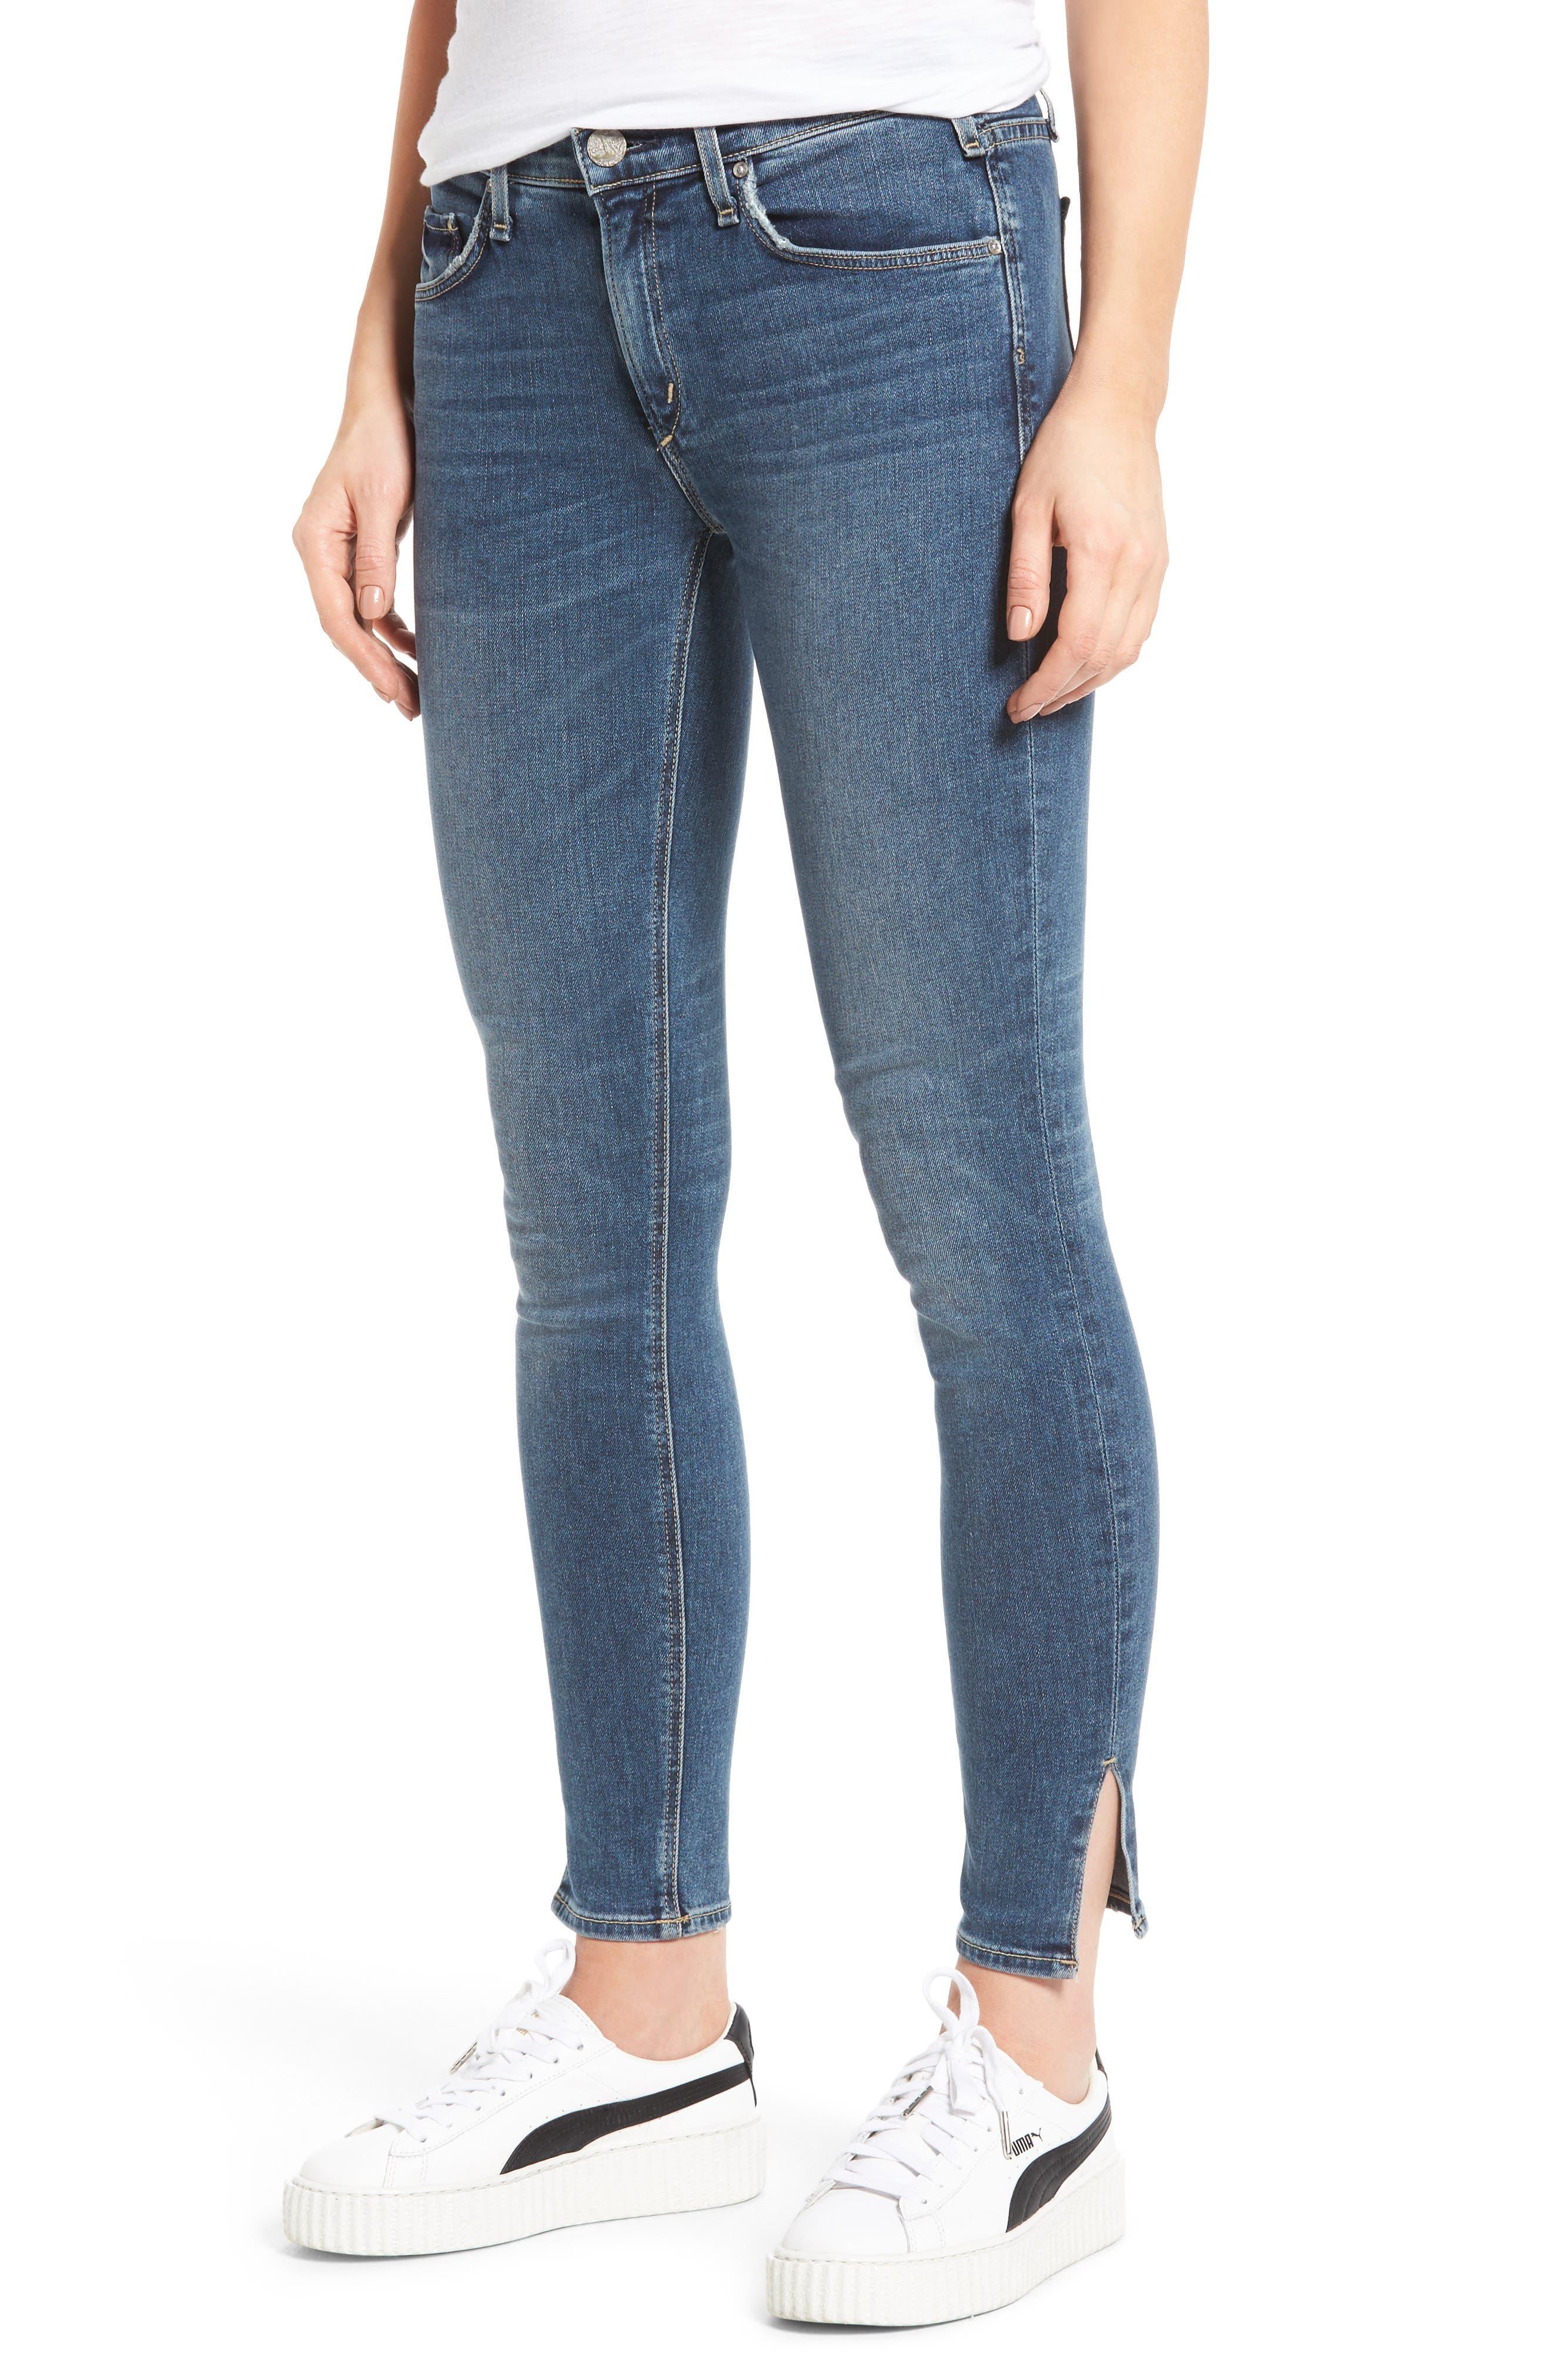 McGuire Side Slit Newton Skinny Jeans (Tropicana)